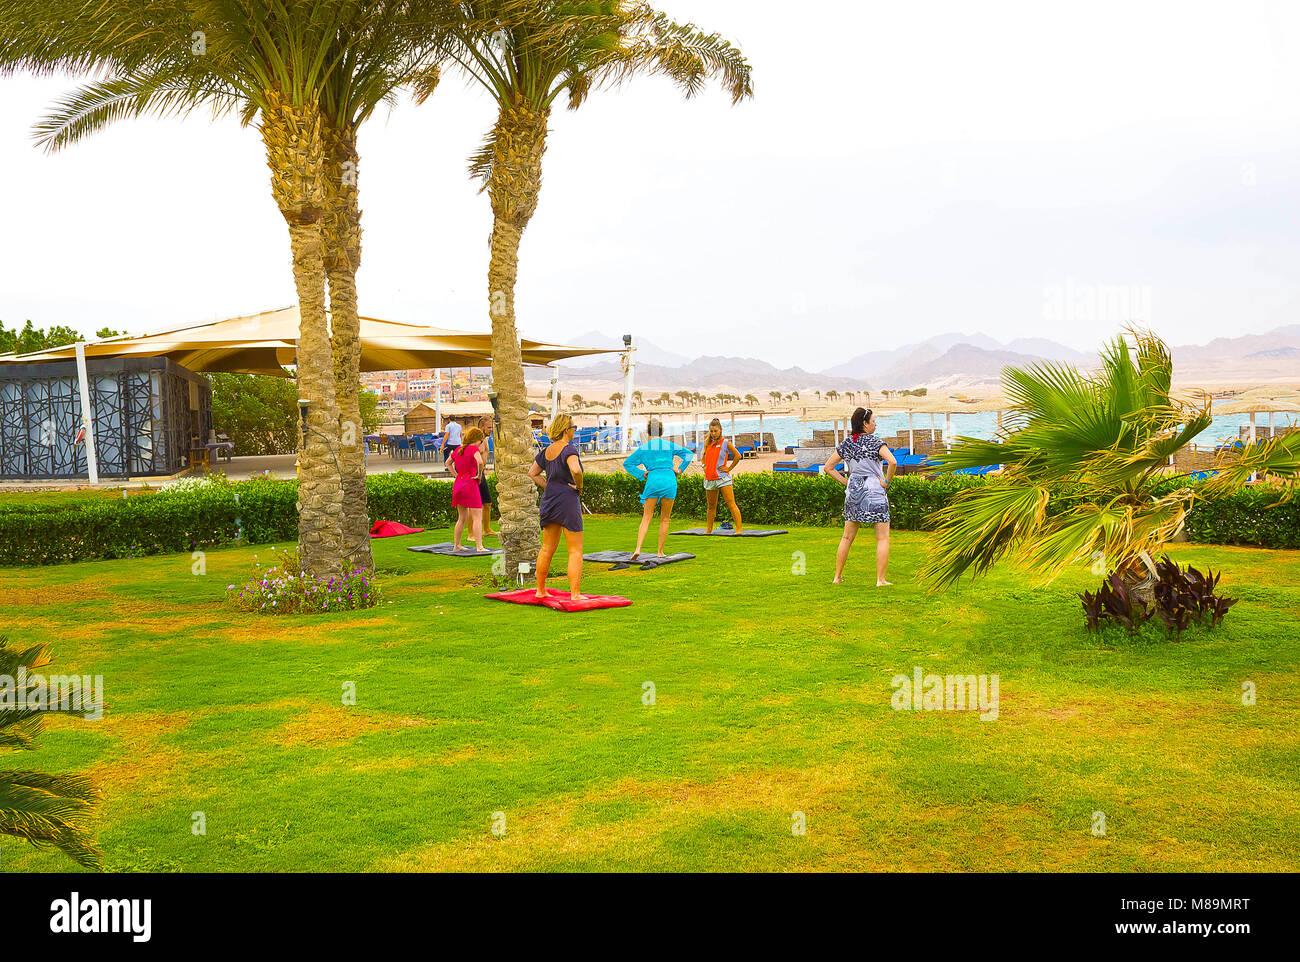 Egypt Beach Resort Stock Photos & Egypt Beach Resort Stock Images ...